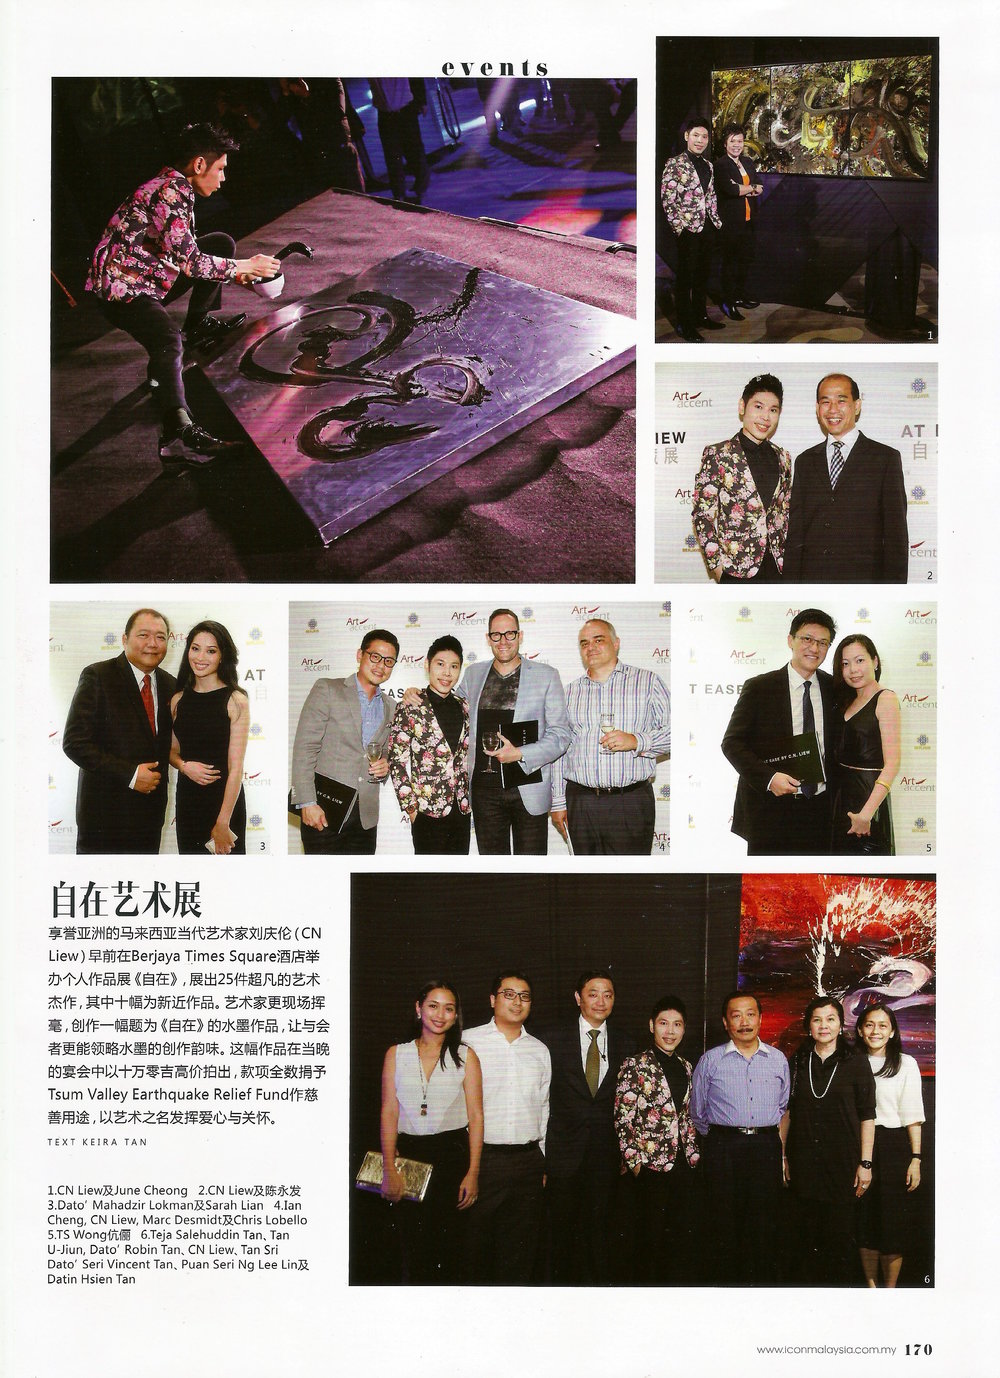 20150901 CNL Icon Malaysia pg170.jpeg